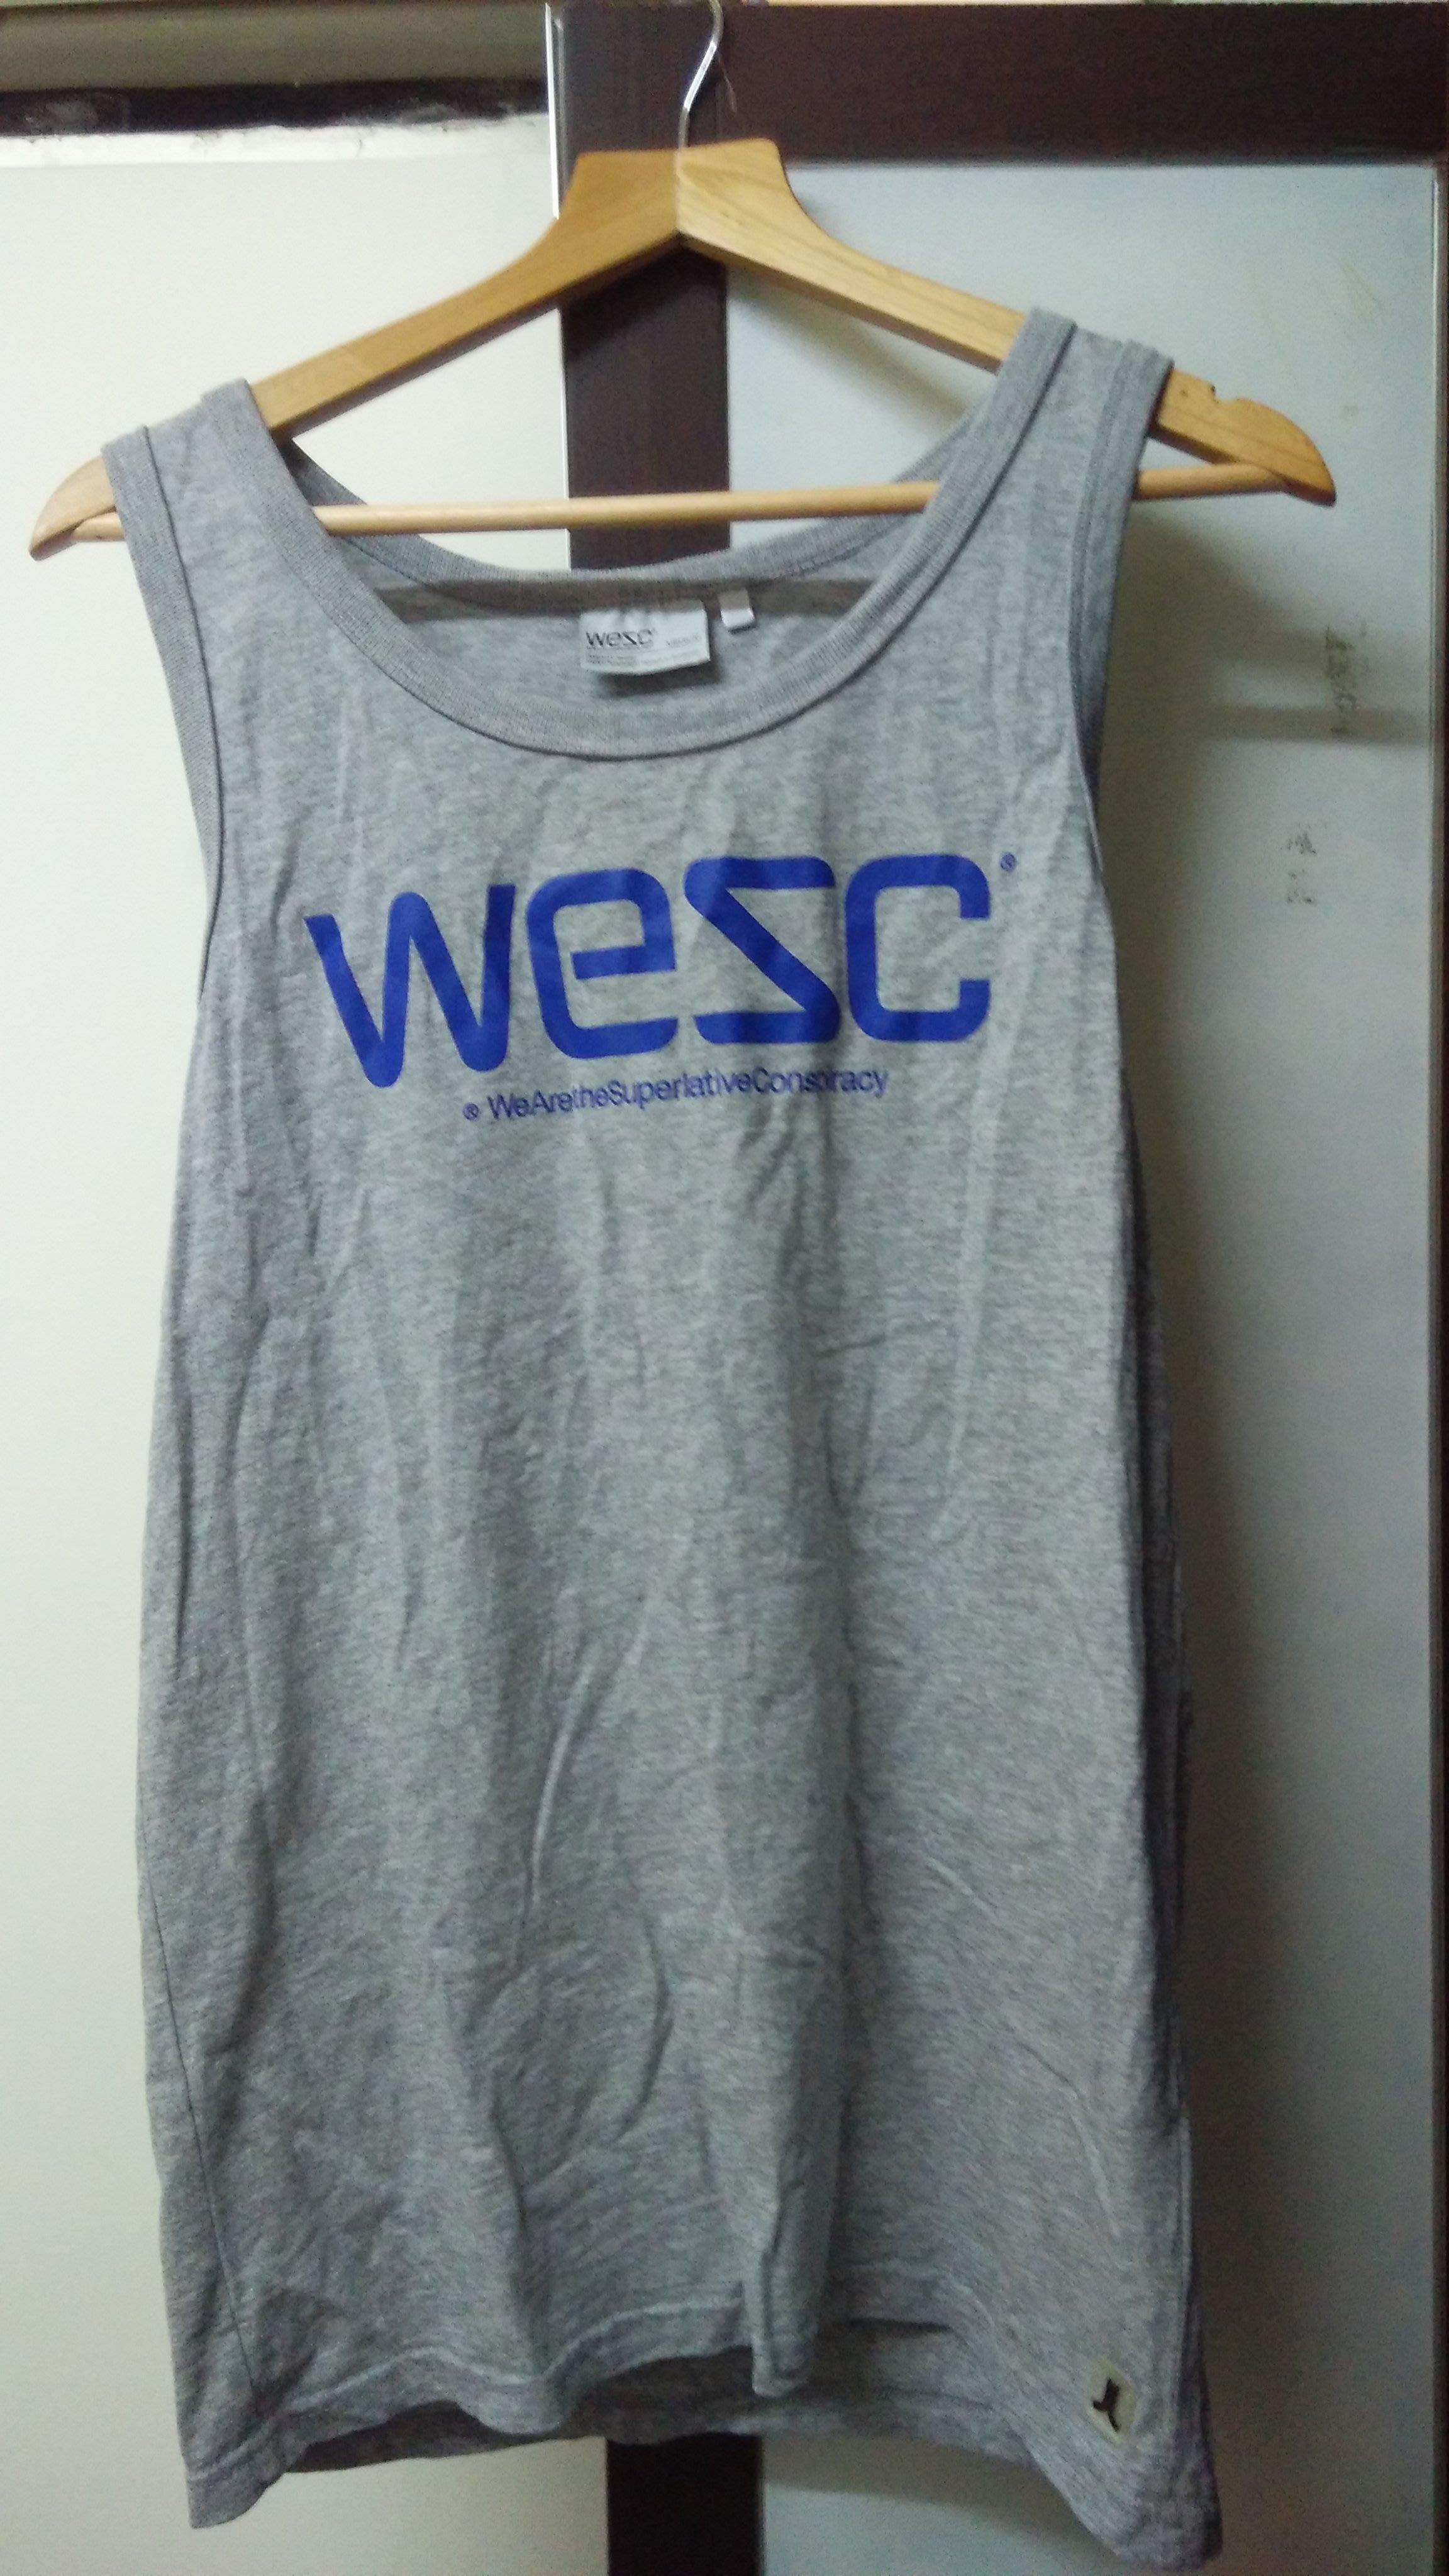 ASOS英國直送現貨 WESC 經典特殊Logo皮標背心 M號